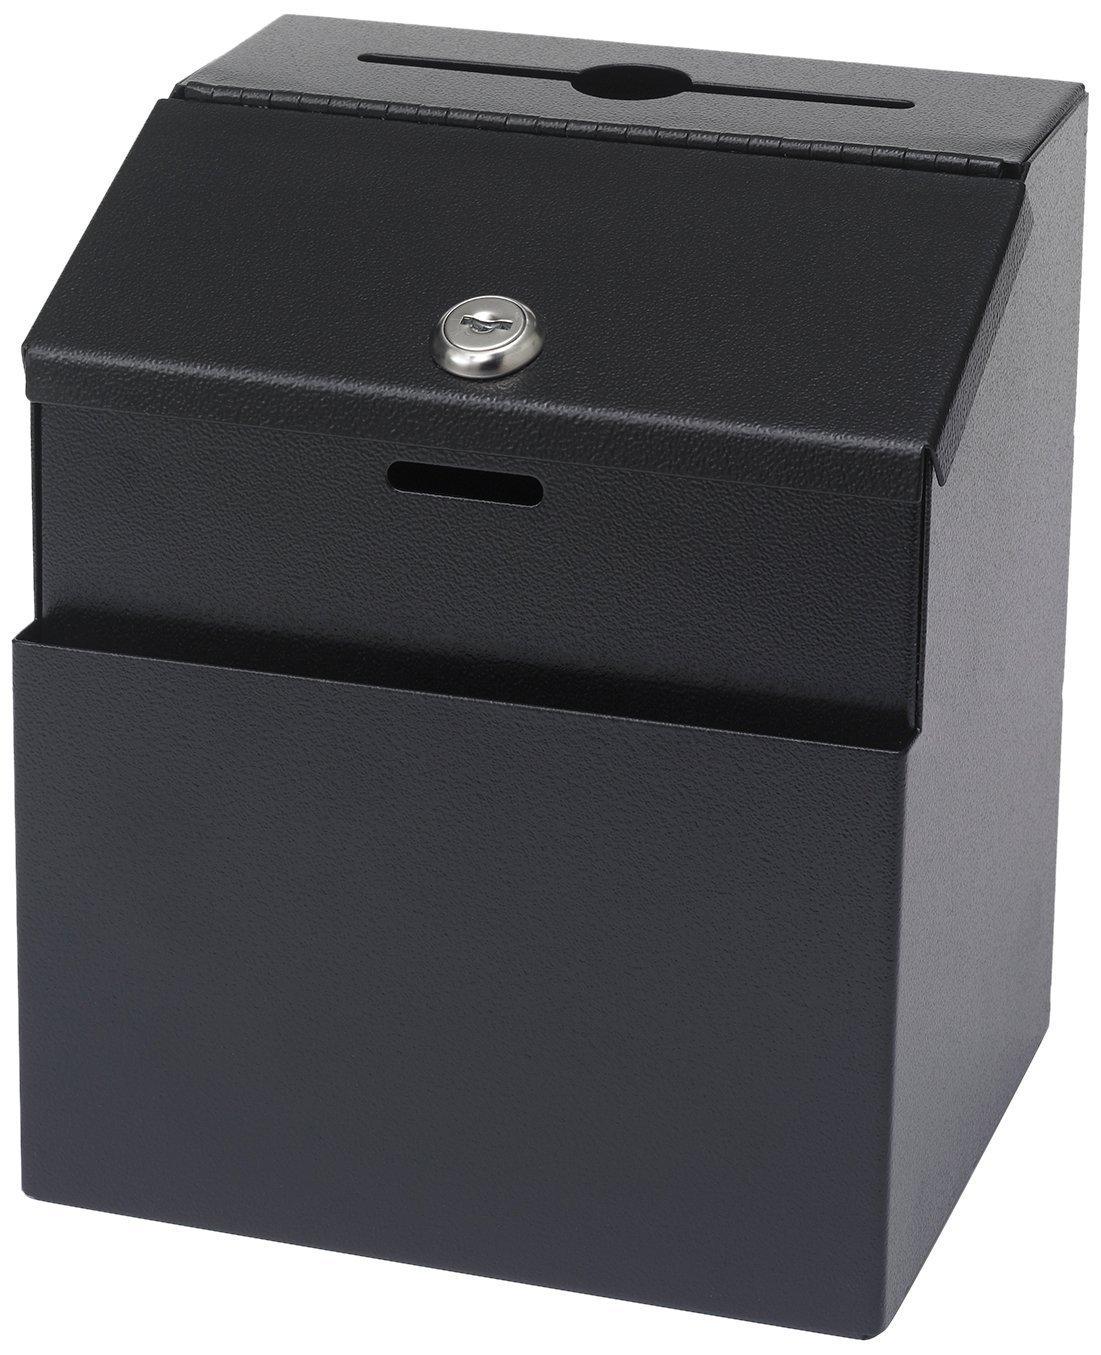 FixtureDisplays Metal Donation Suggestion Key Drop Box Express Checkout Comments sales lead box 11118